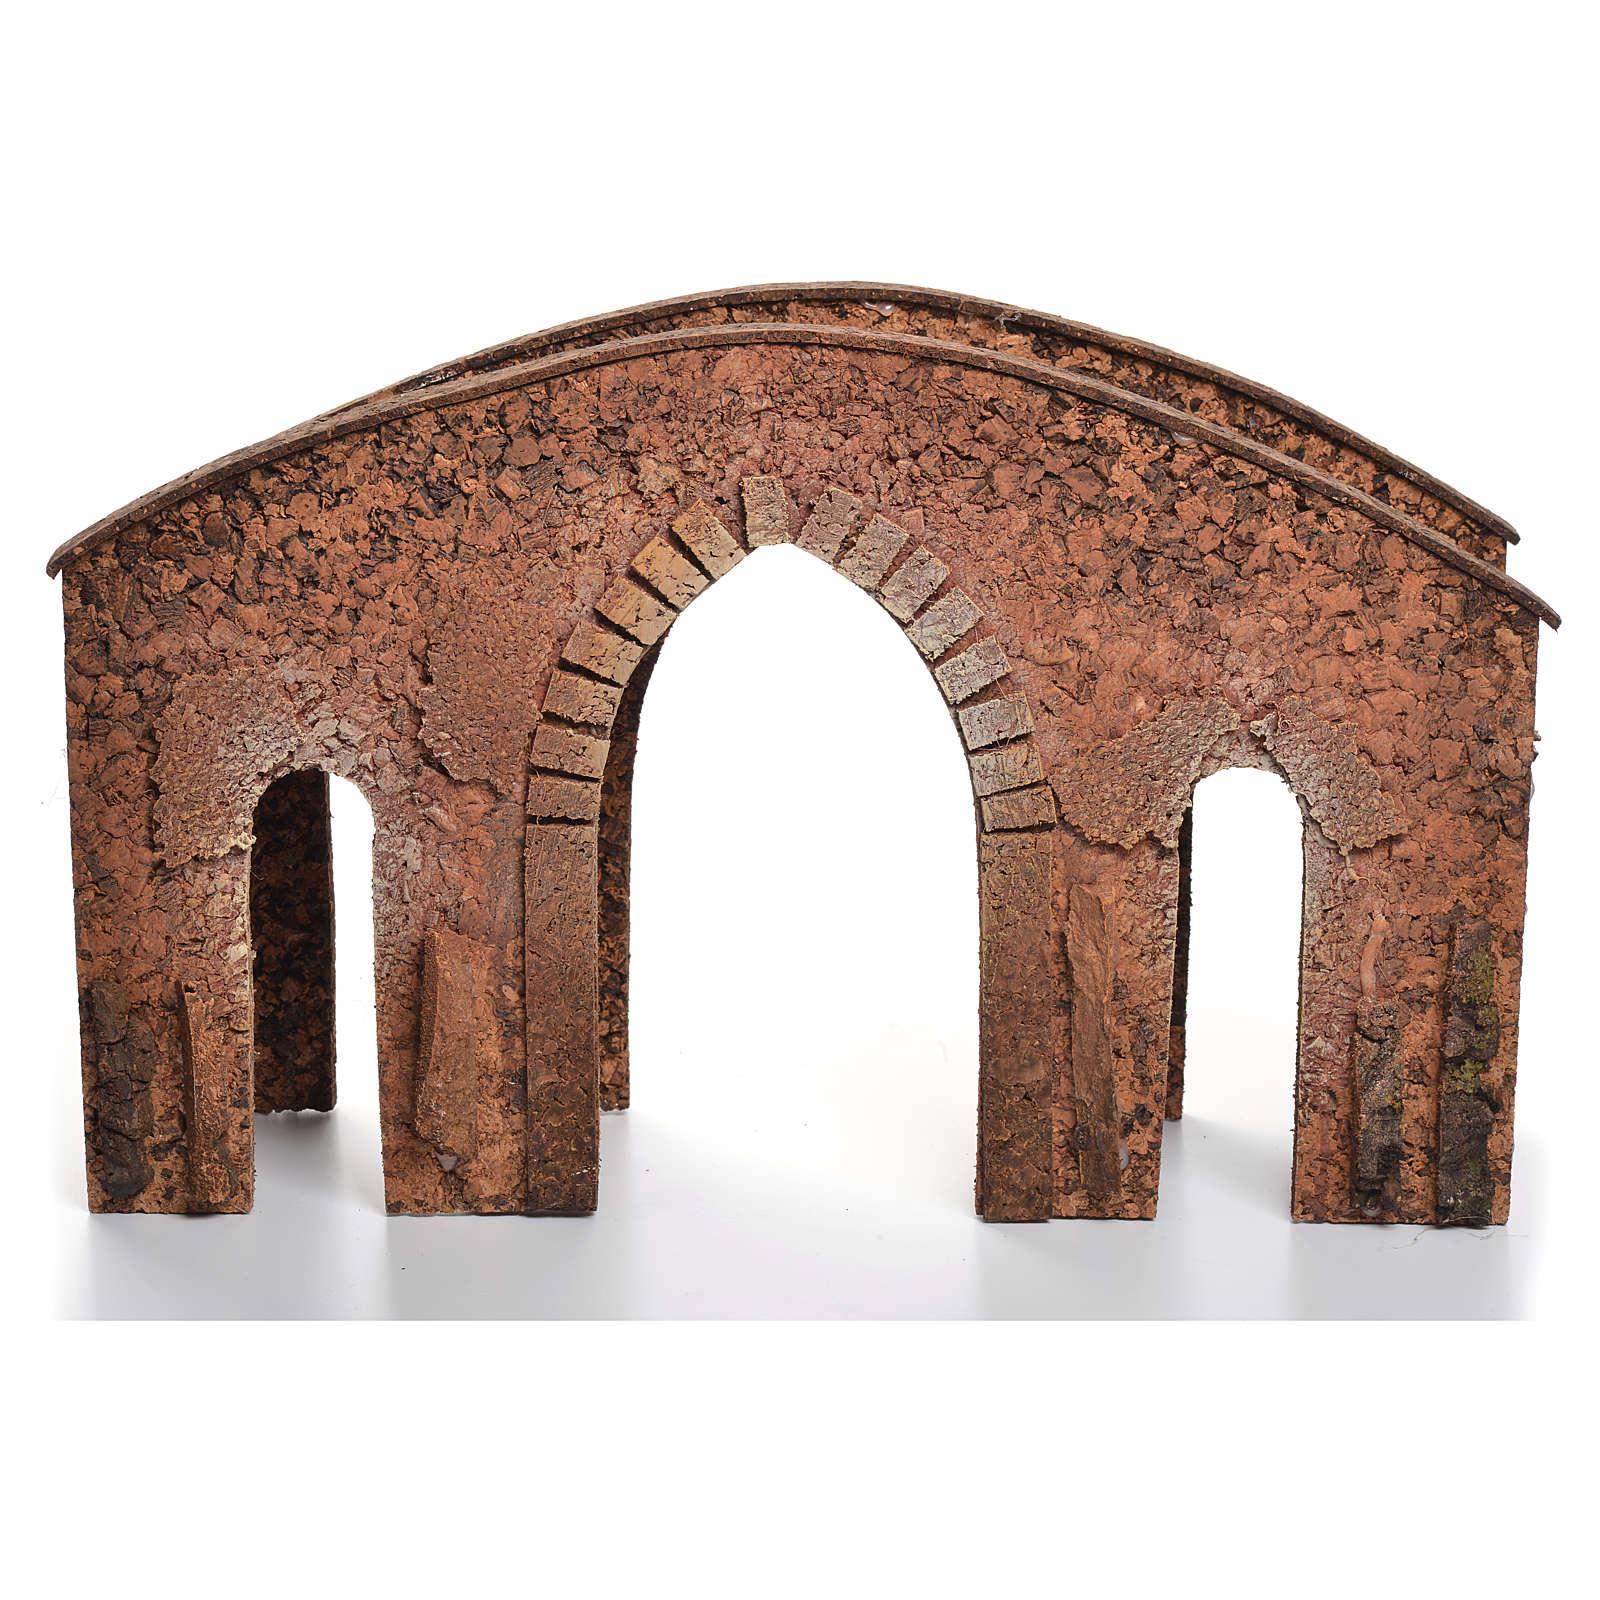 Bridge in cork for nativities measuring 25x40x12cm 4